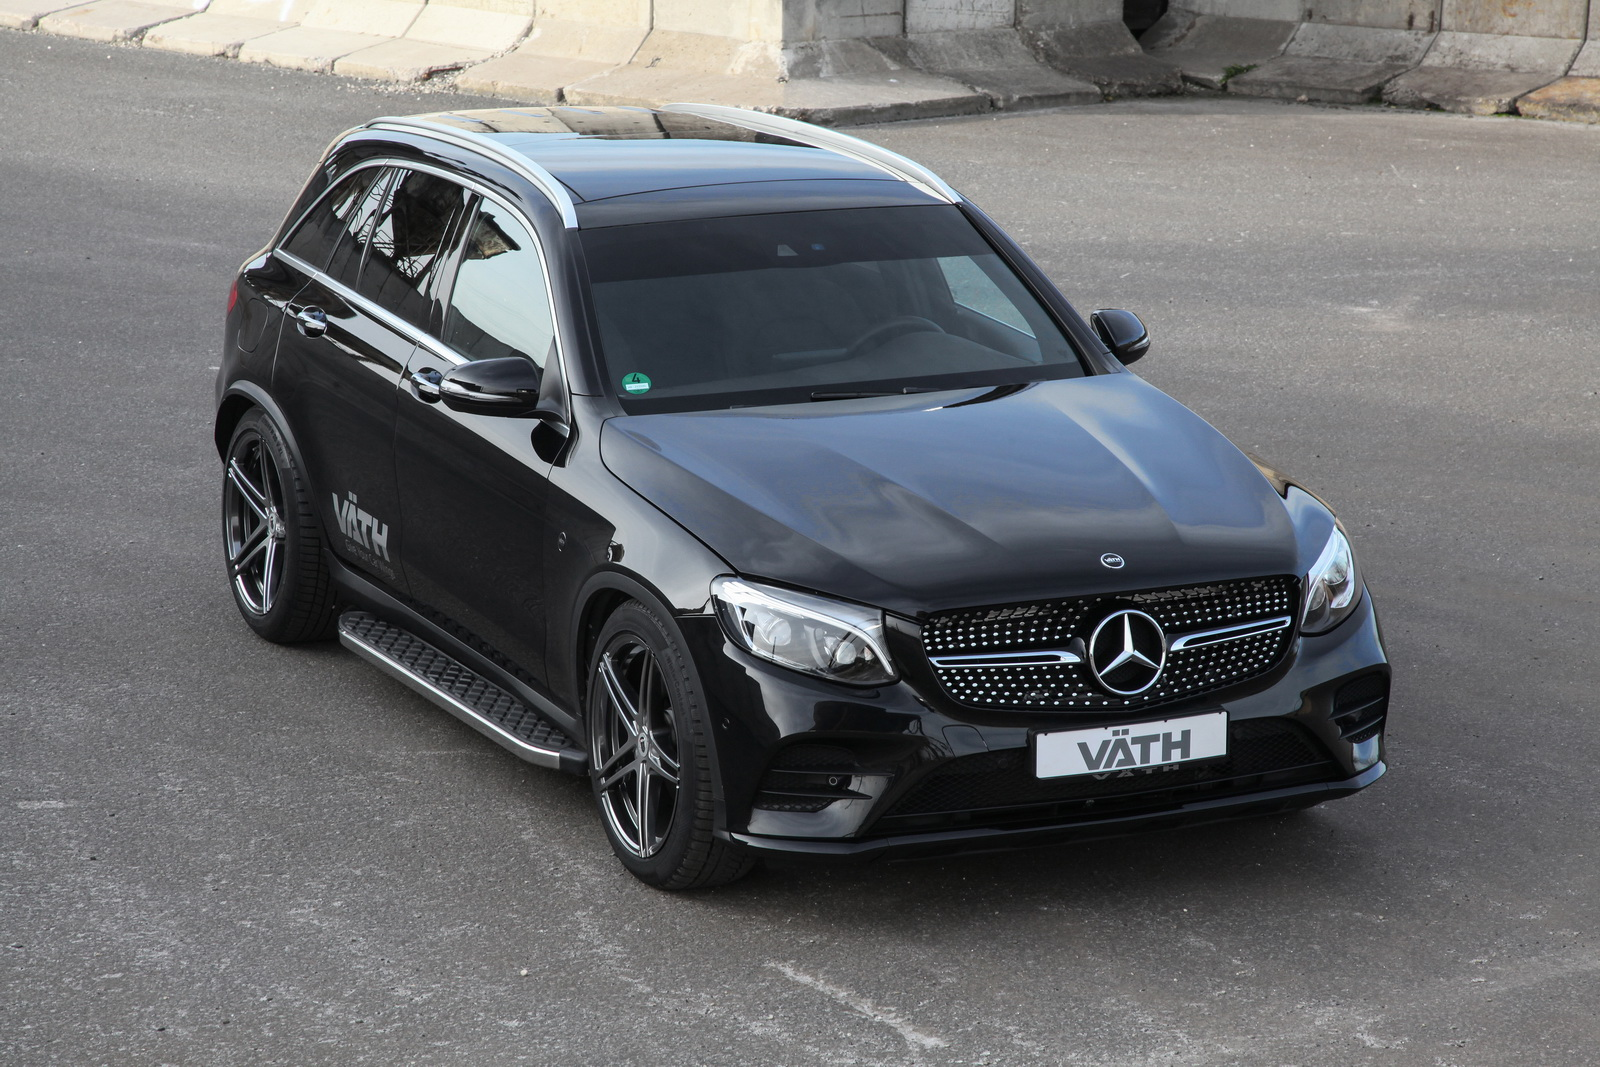 Mercedes_GLC220d_by_Vath_09